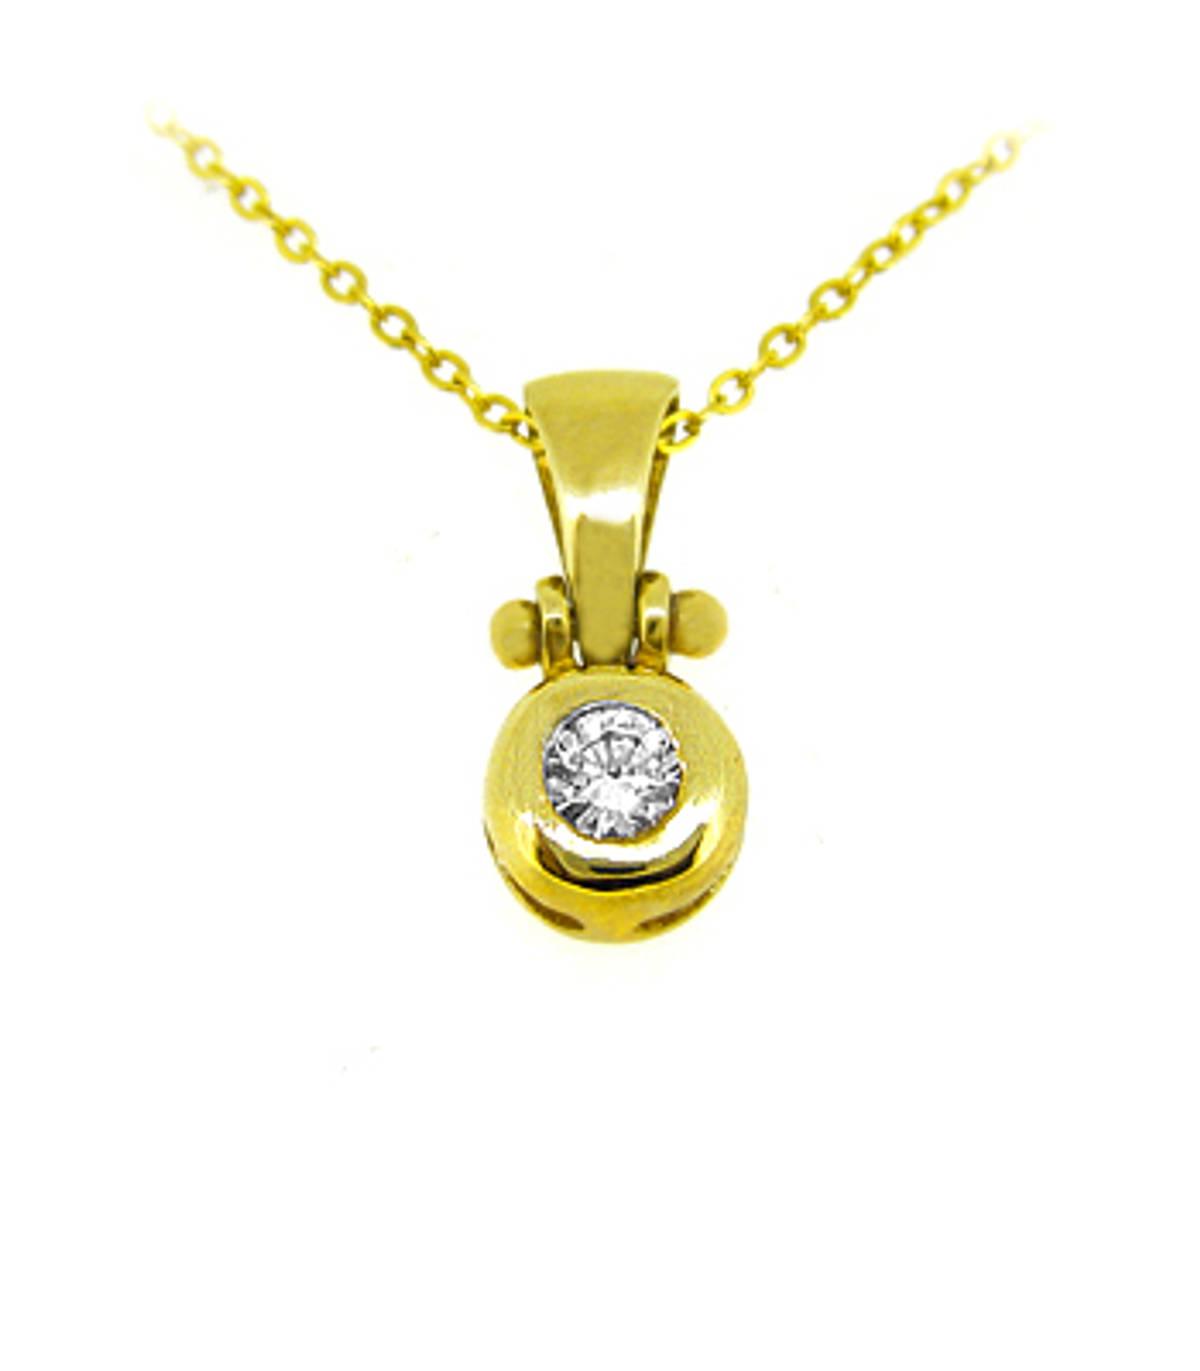 "9k yellow gold CZ rubover set pendant on 9k yellow gold 18"" chain Metal: 9k yellow gold  9k yellow gold 18"" chain Length  1.9cm  Width  0.8cm Made in Ireland"